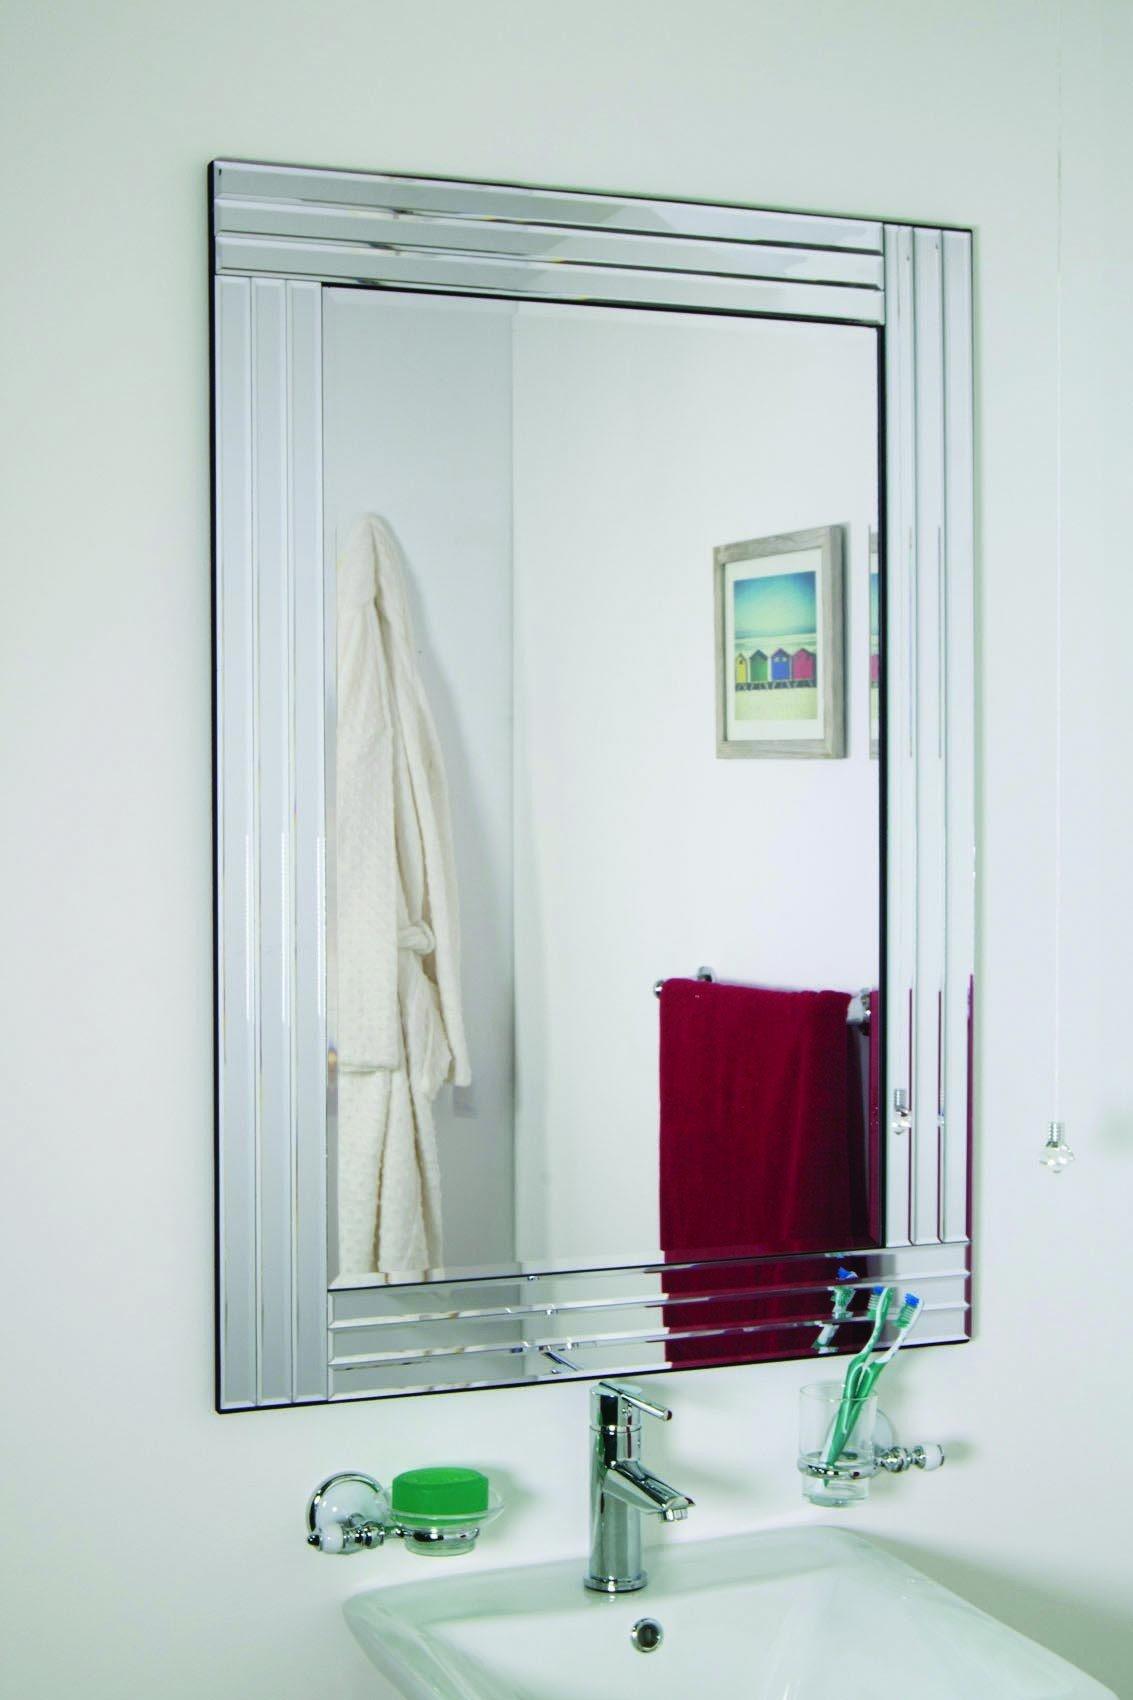 Large Bathroom Mirrors: Amazon.co.uk